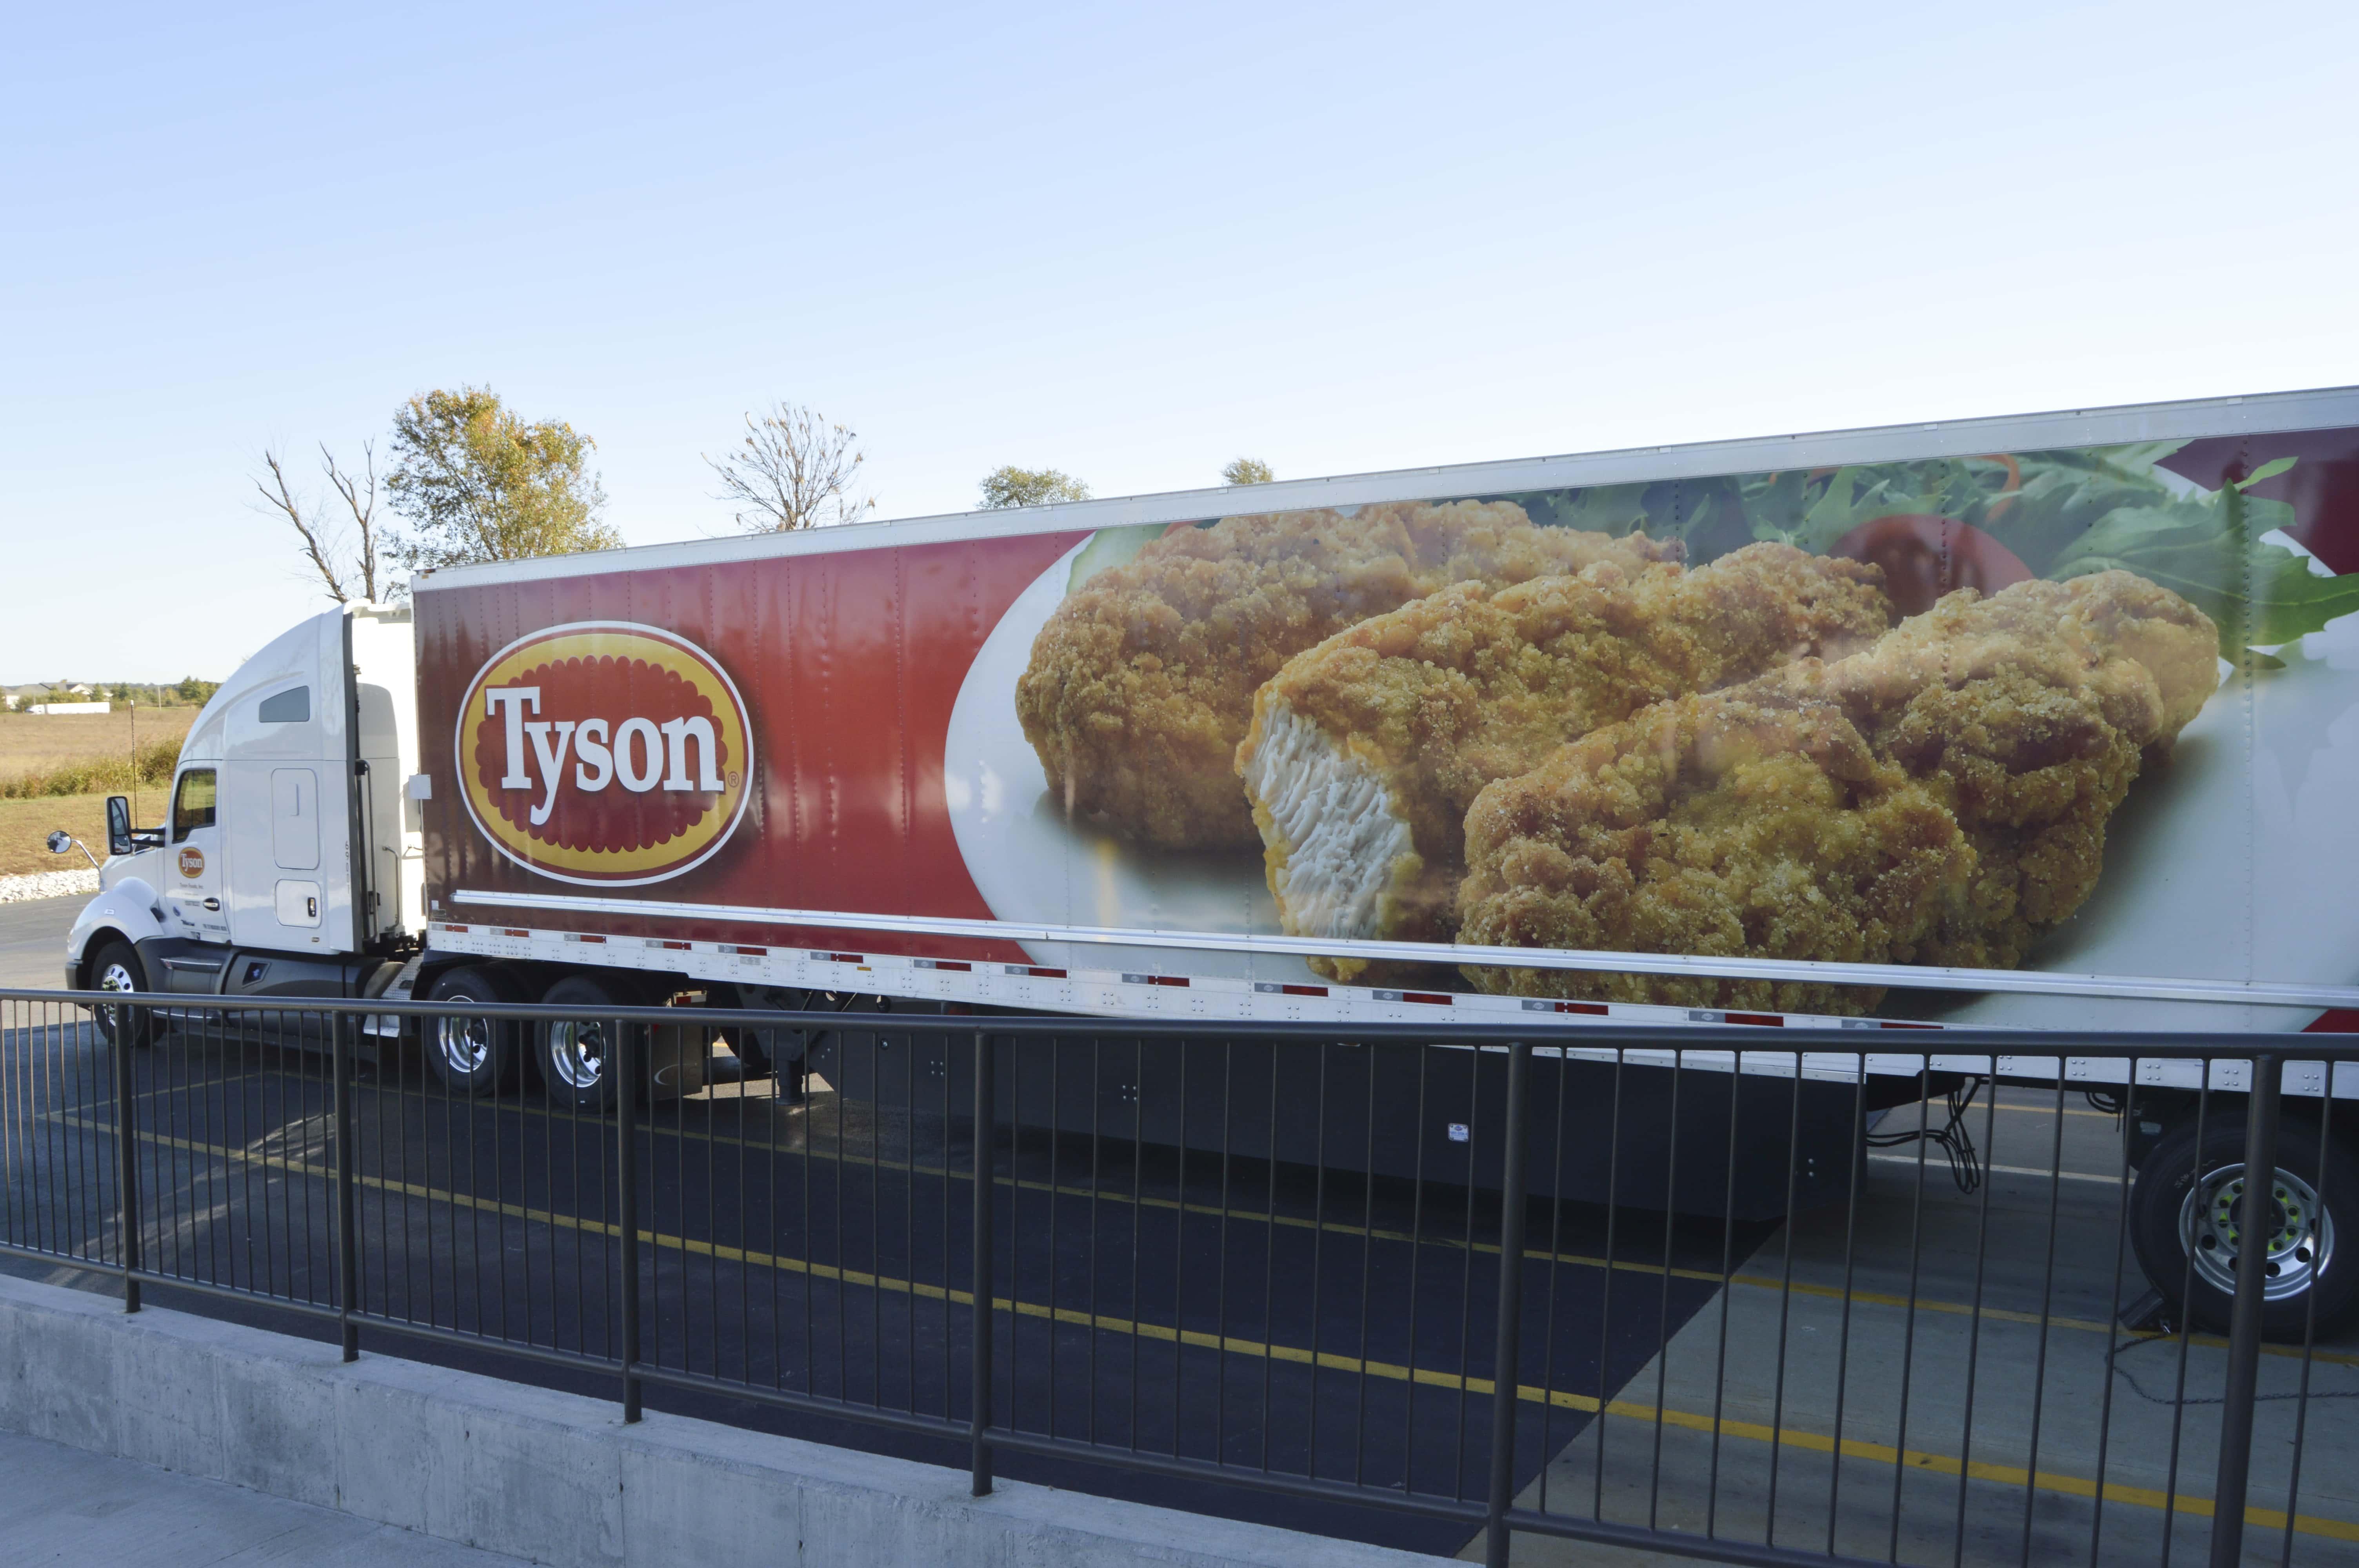 Tyson donation